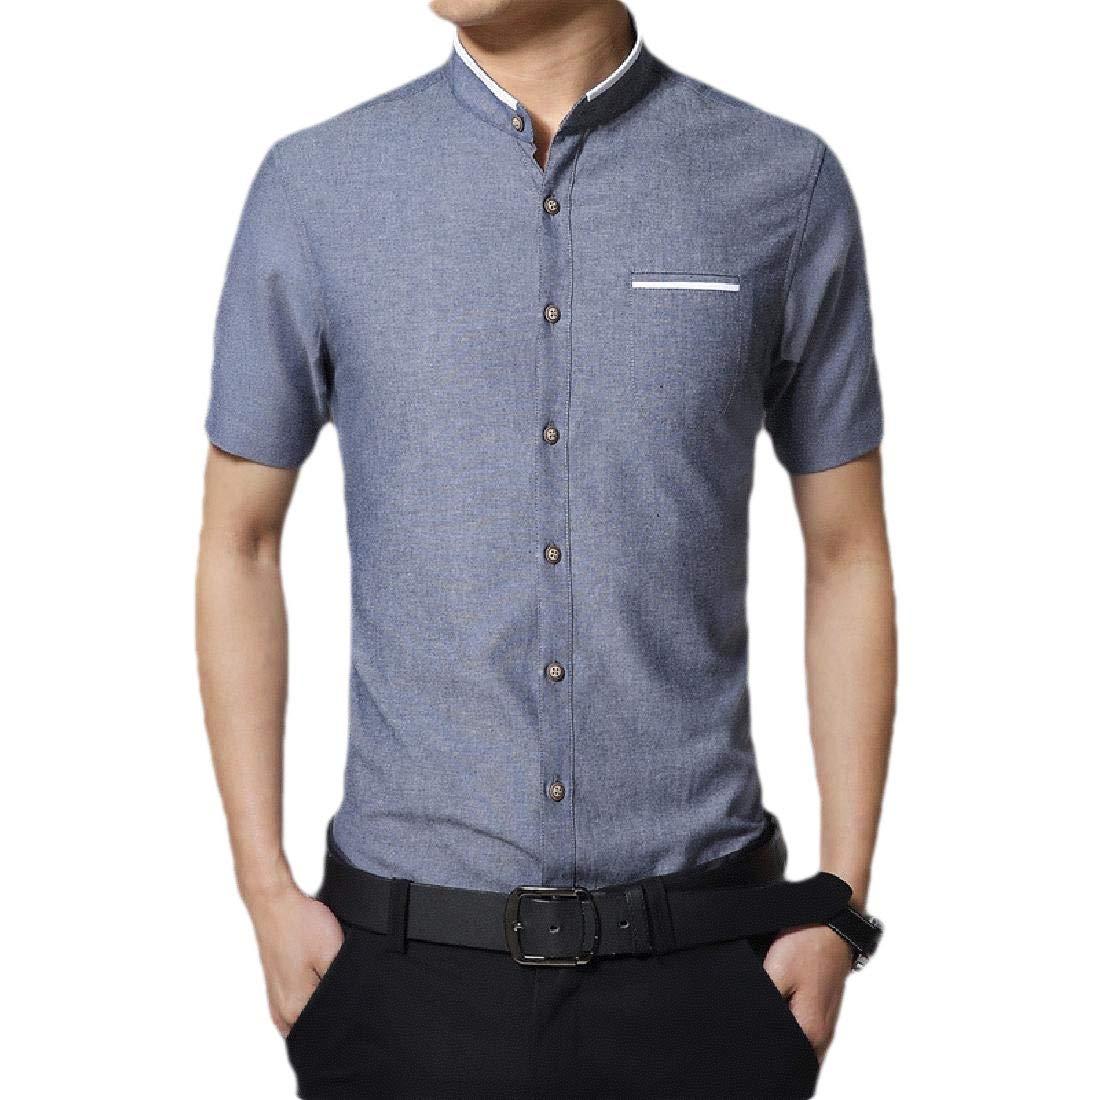 Britainlotus Mens Short Sleeve Casual Dress Shirts Button Down Business Shirt